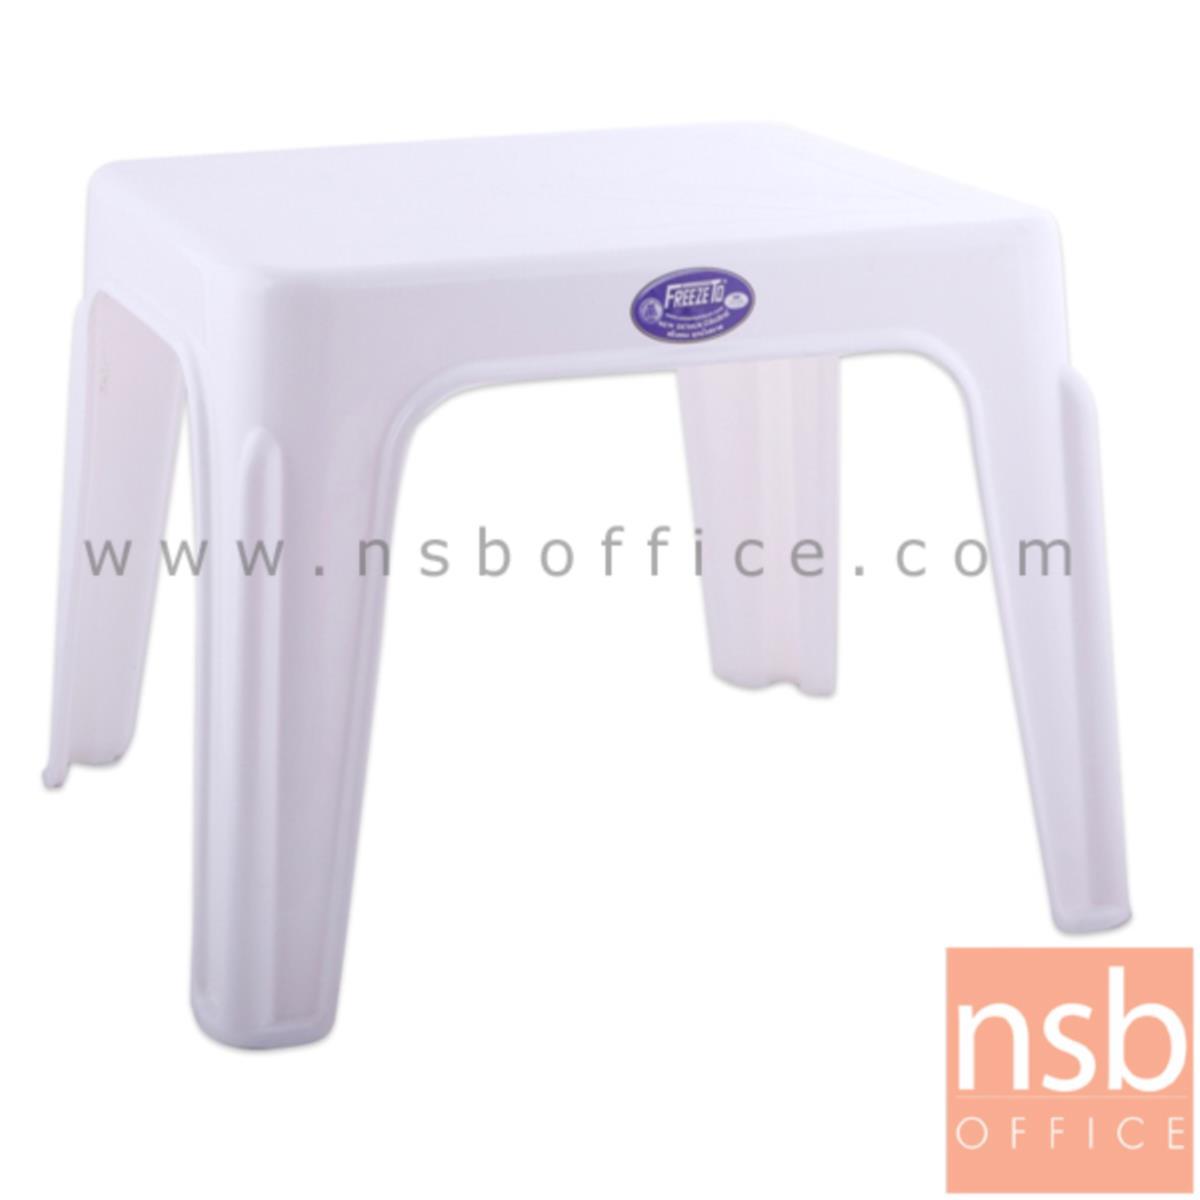 B10A068:โต๊ะพลาสติก รุ่น FANCY_TABLE ขนาด 49W cm. พลาสติกเกรด A